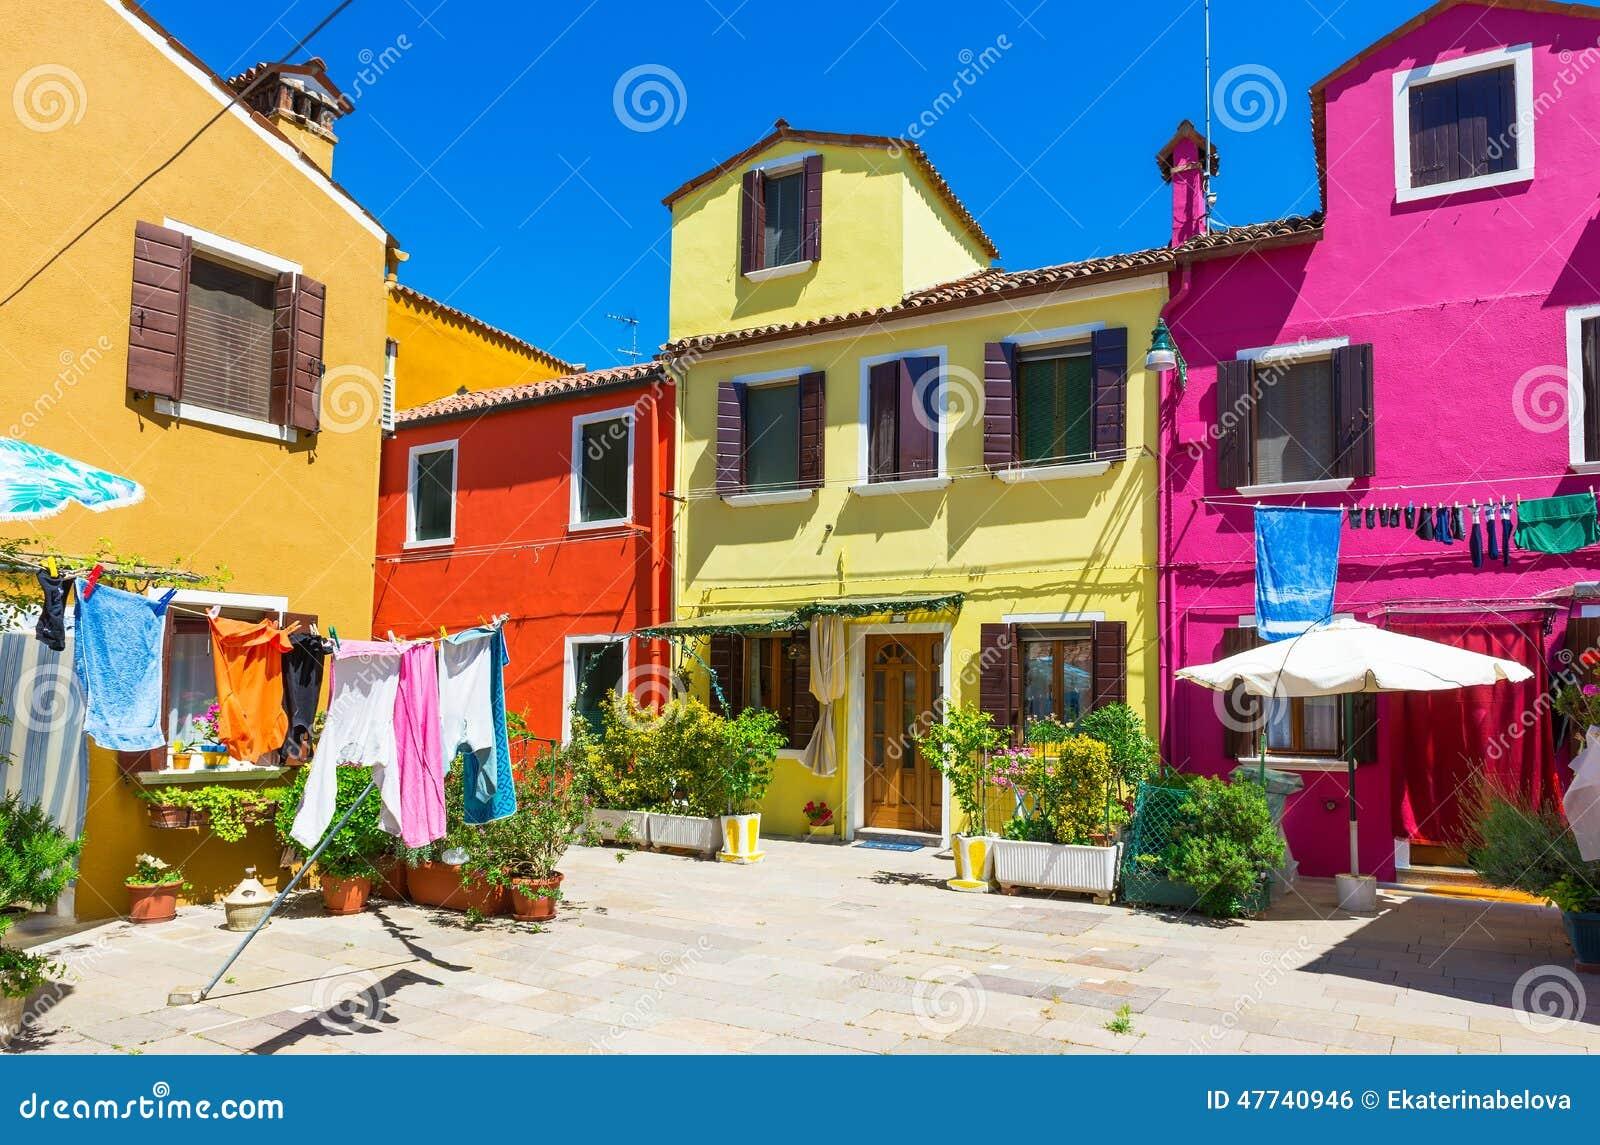 travel colorful scenes